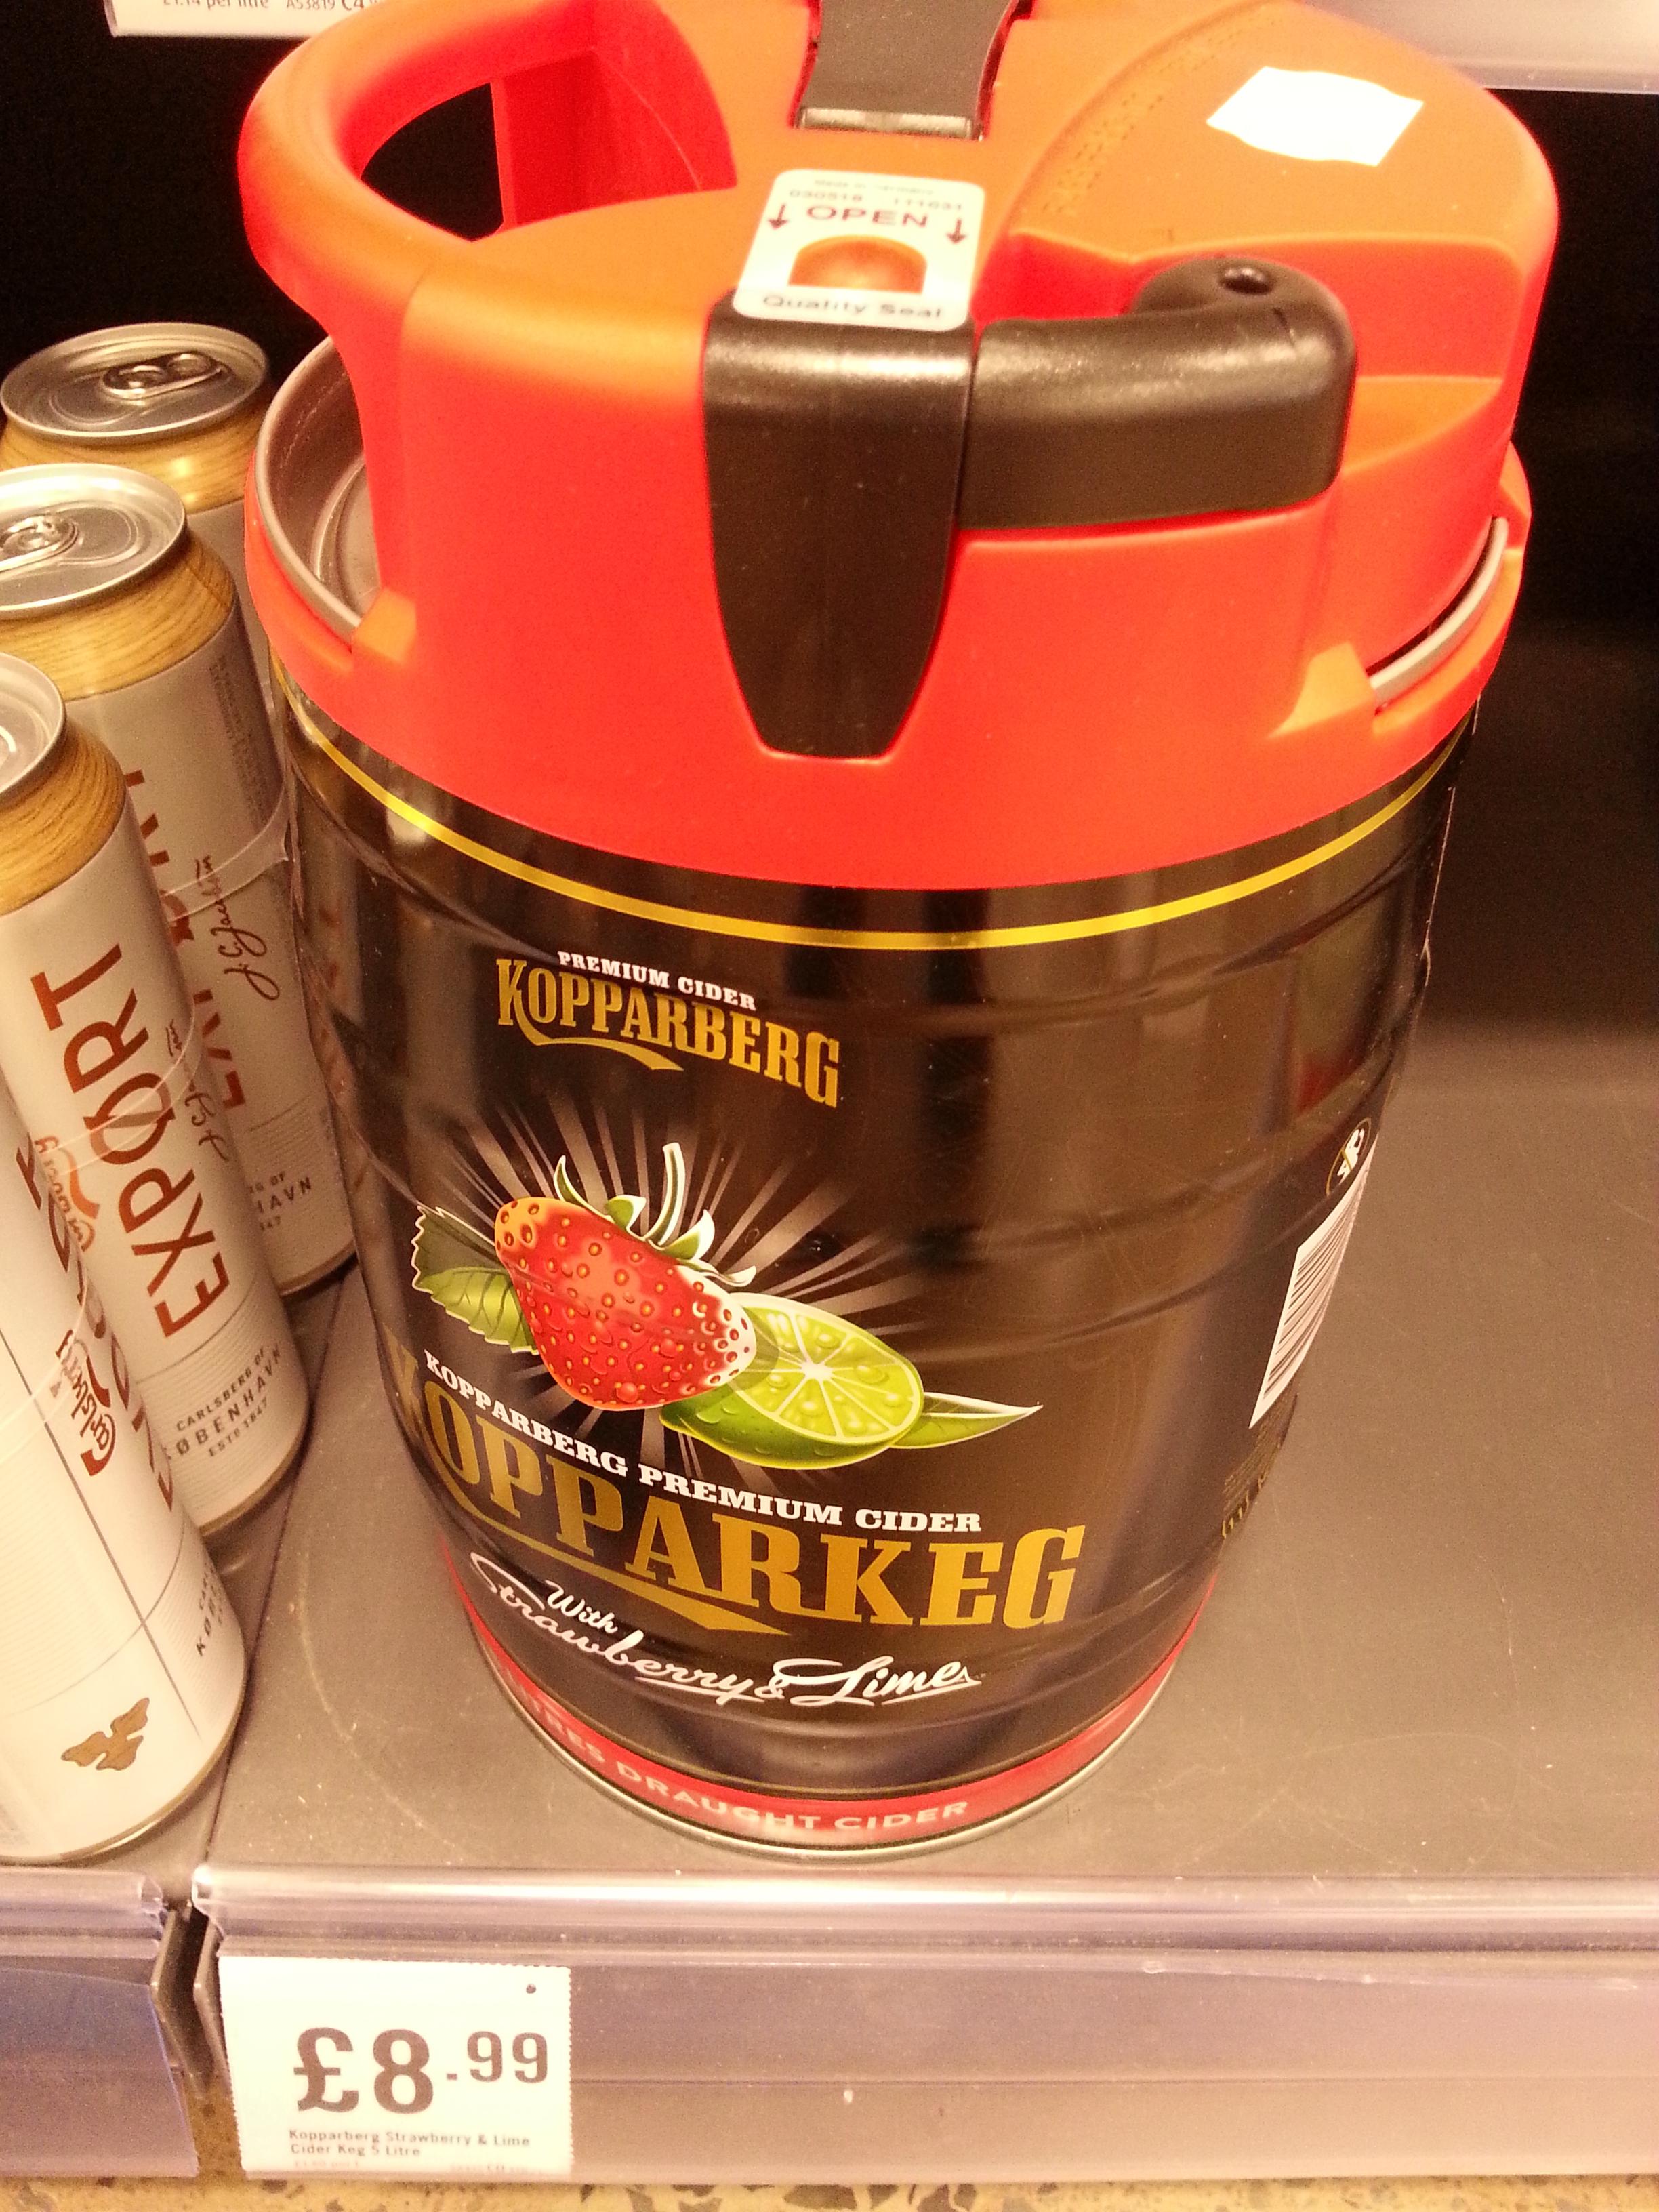 Kopperberg Strawberry and Lime Cider 5 ltr keg £8.99 @ Iceland Warehouse